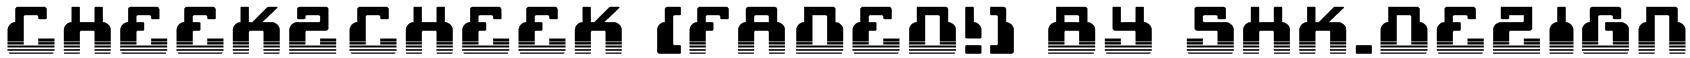 cheek2cheek (faded!) by shk.dezign Font